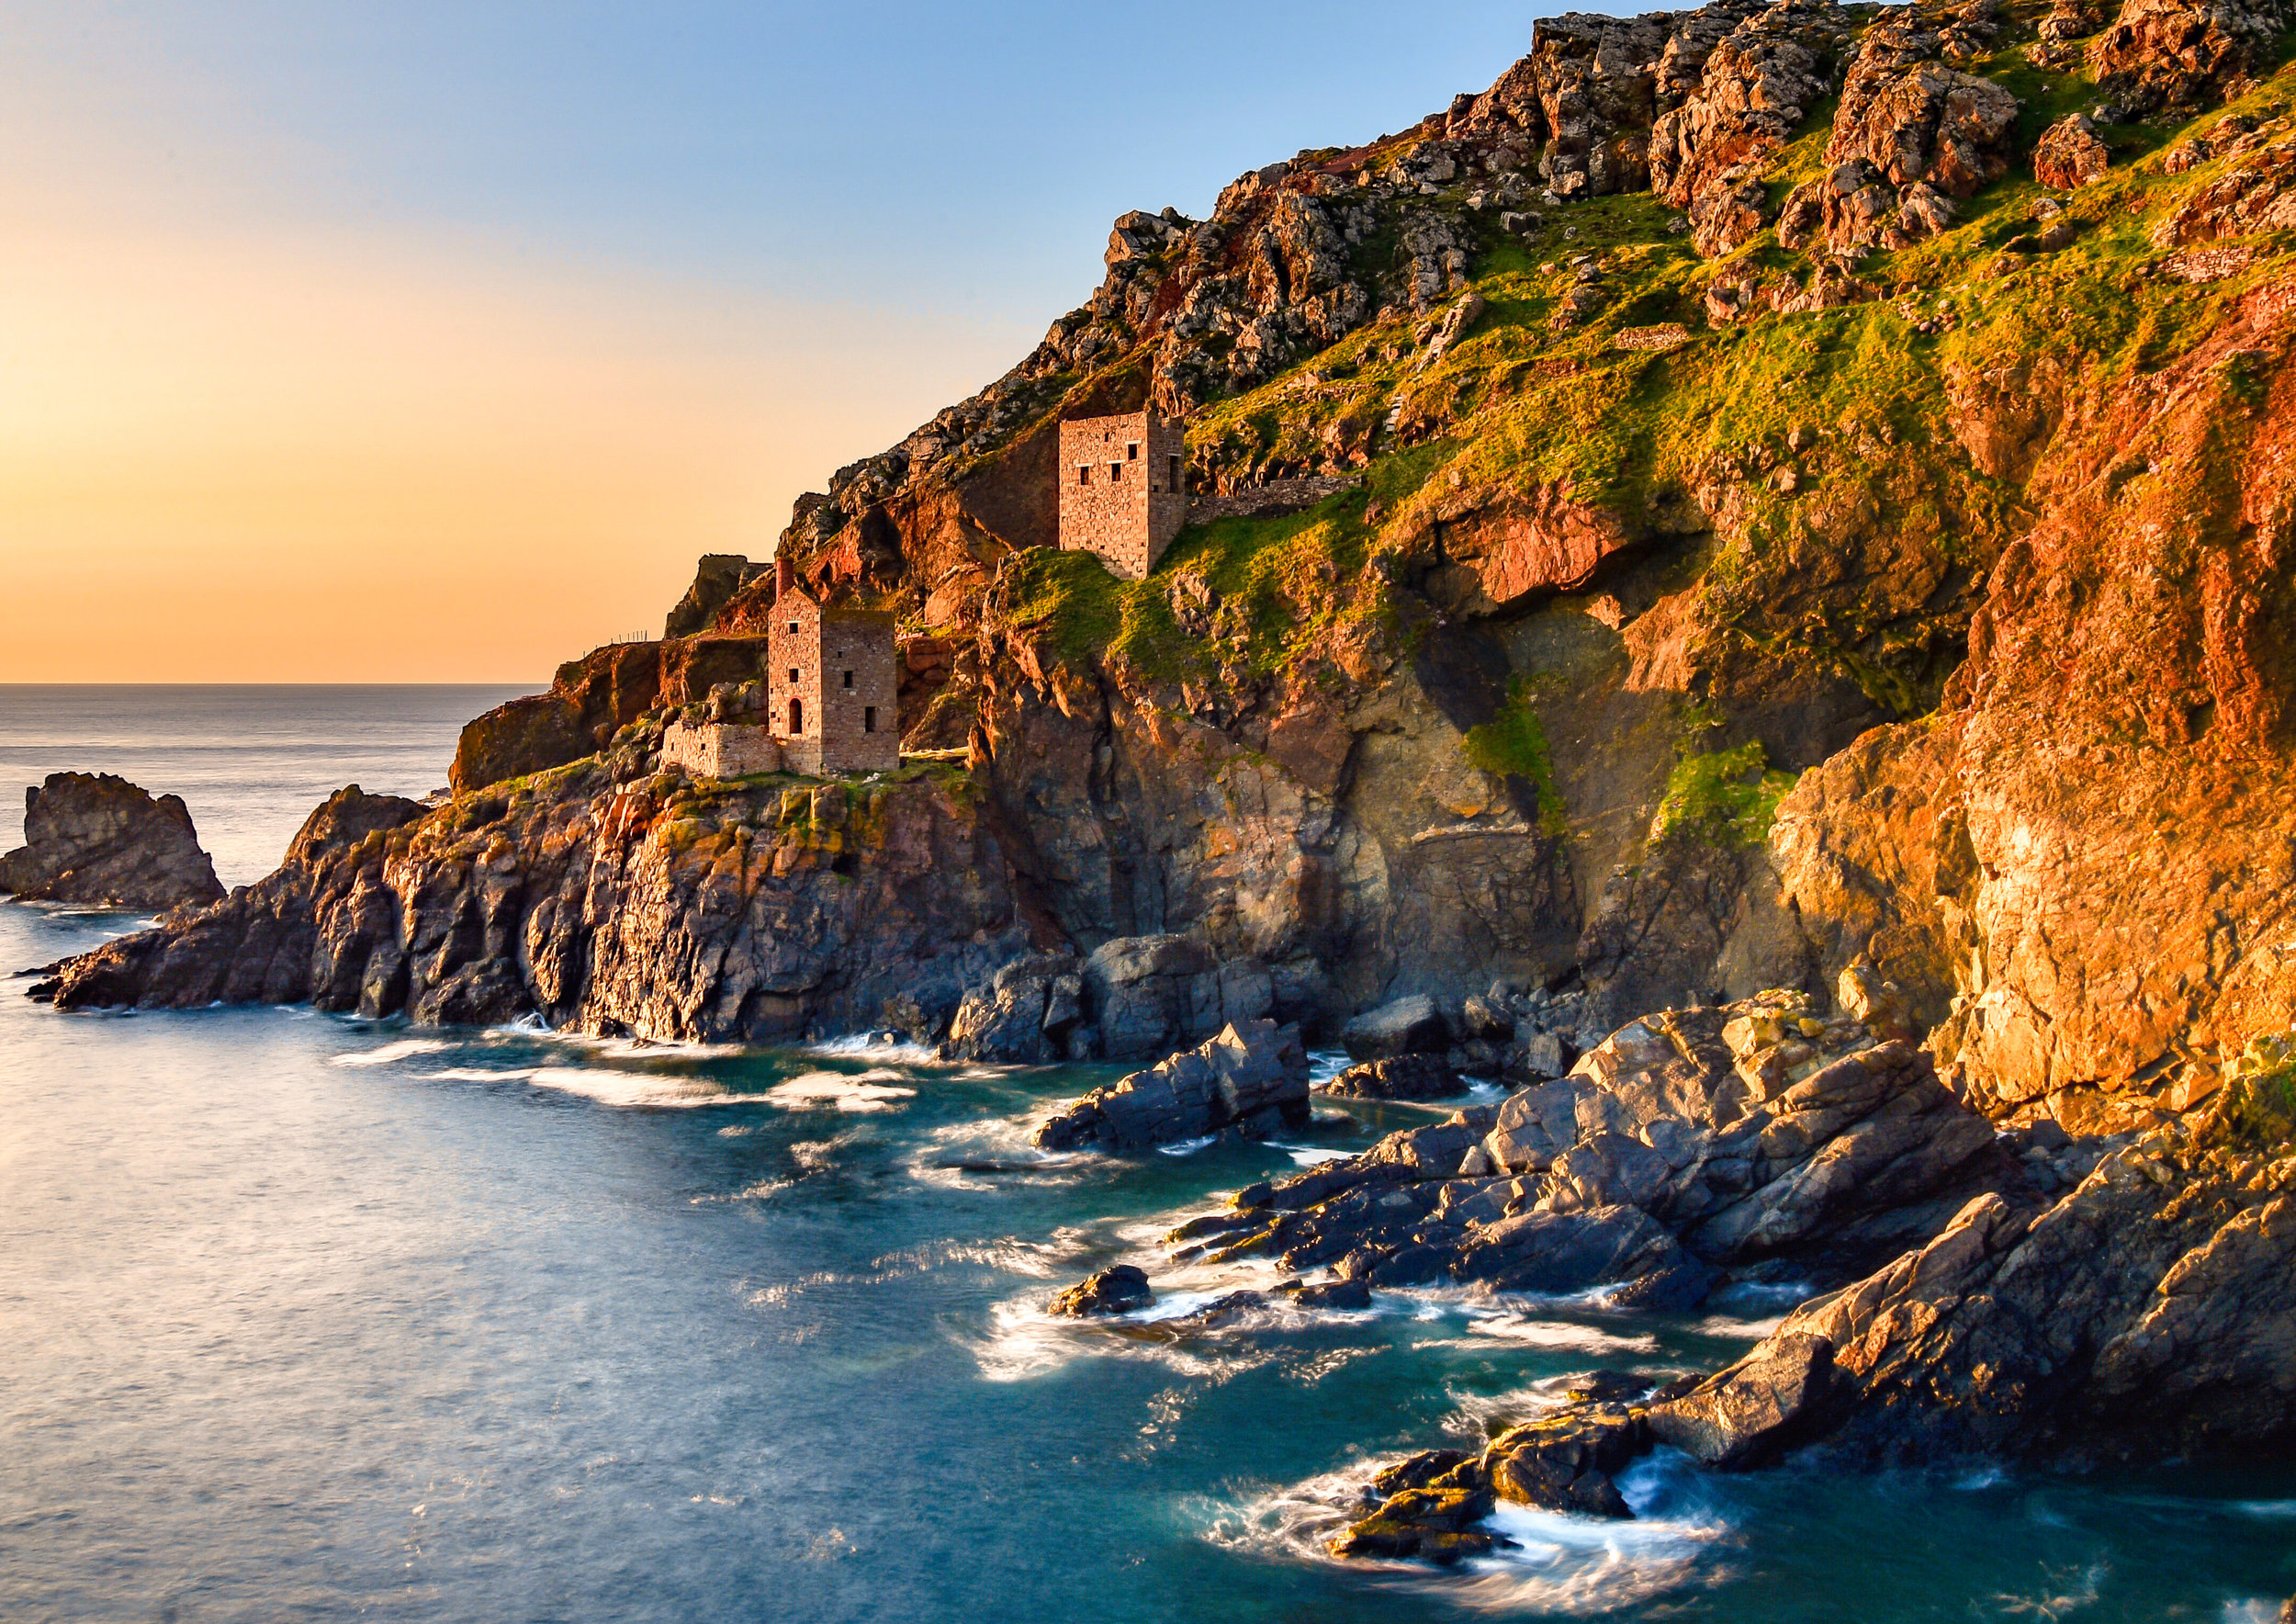 Botallack Mine Cornish Seasalt and Sage Inspiration